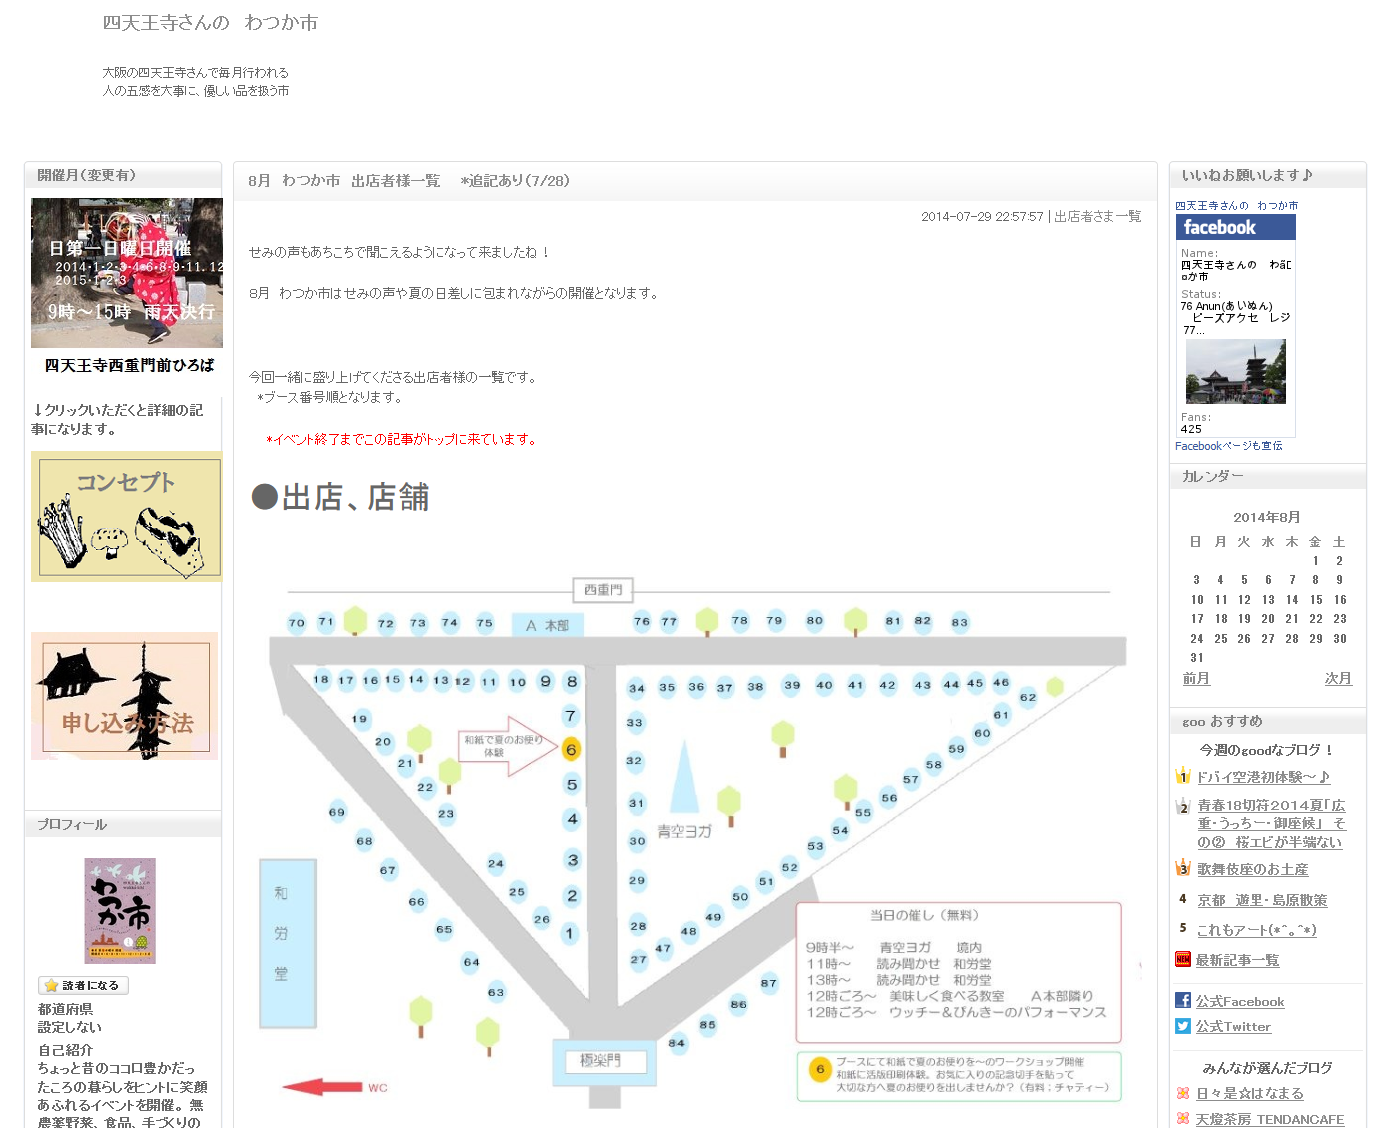 http://blog.goo.ne.jp/jinenichi